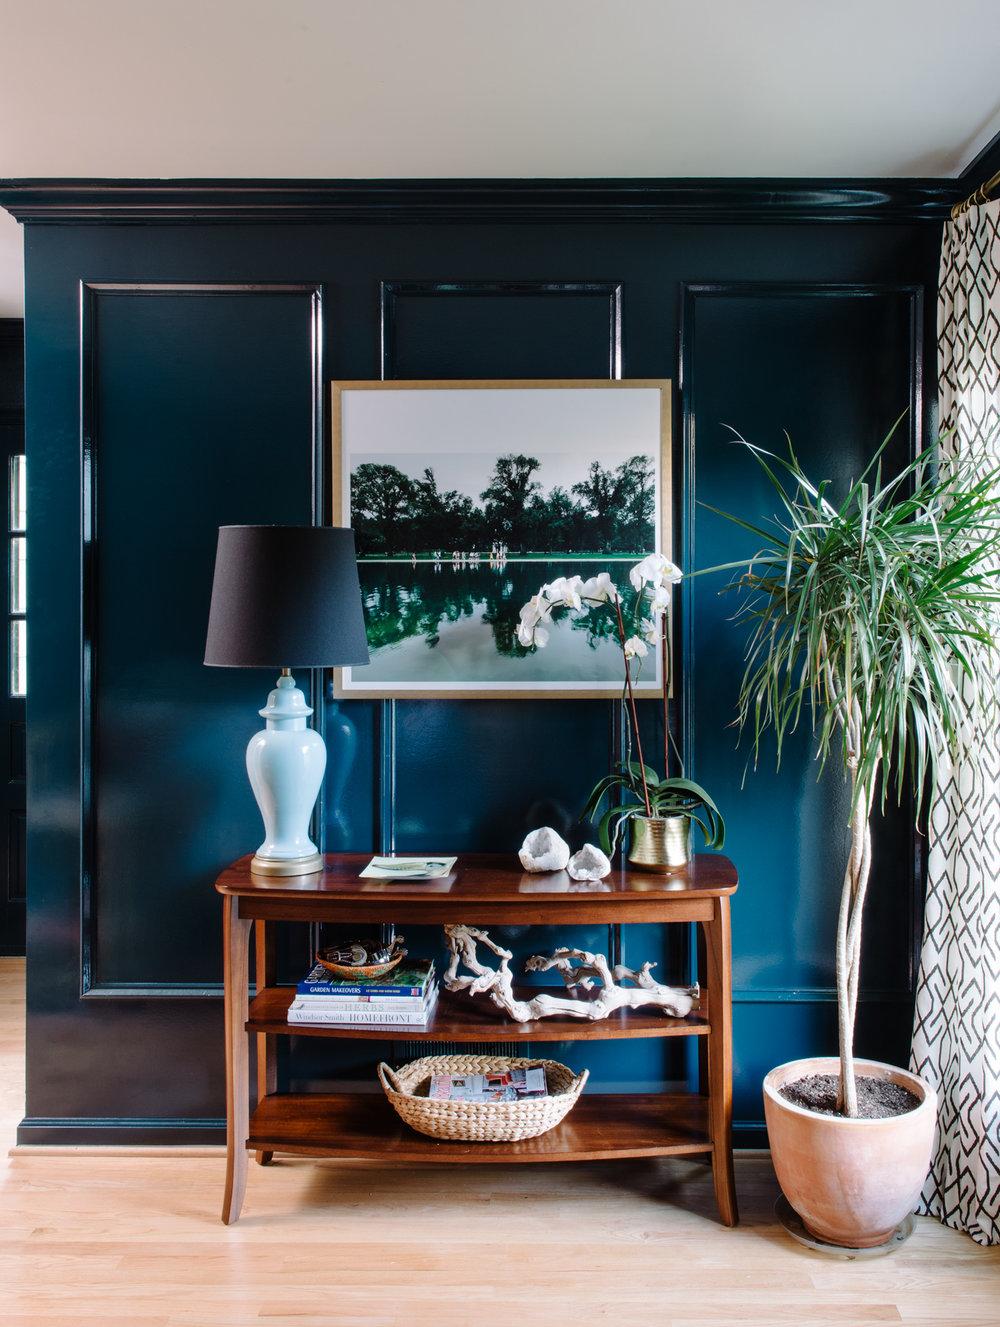 Alison giese interiors timeless interior design in - Interior designer northern virginia ...